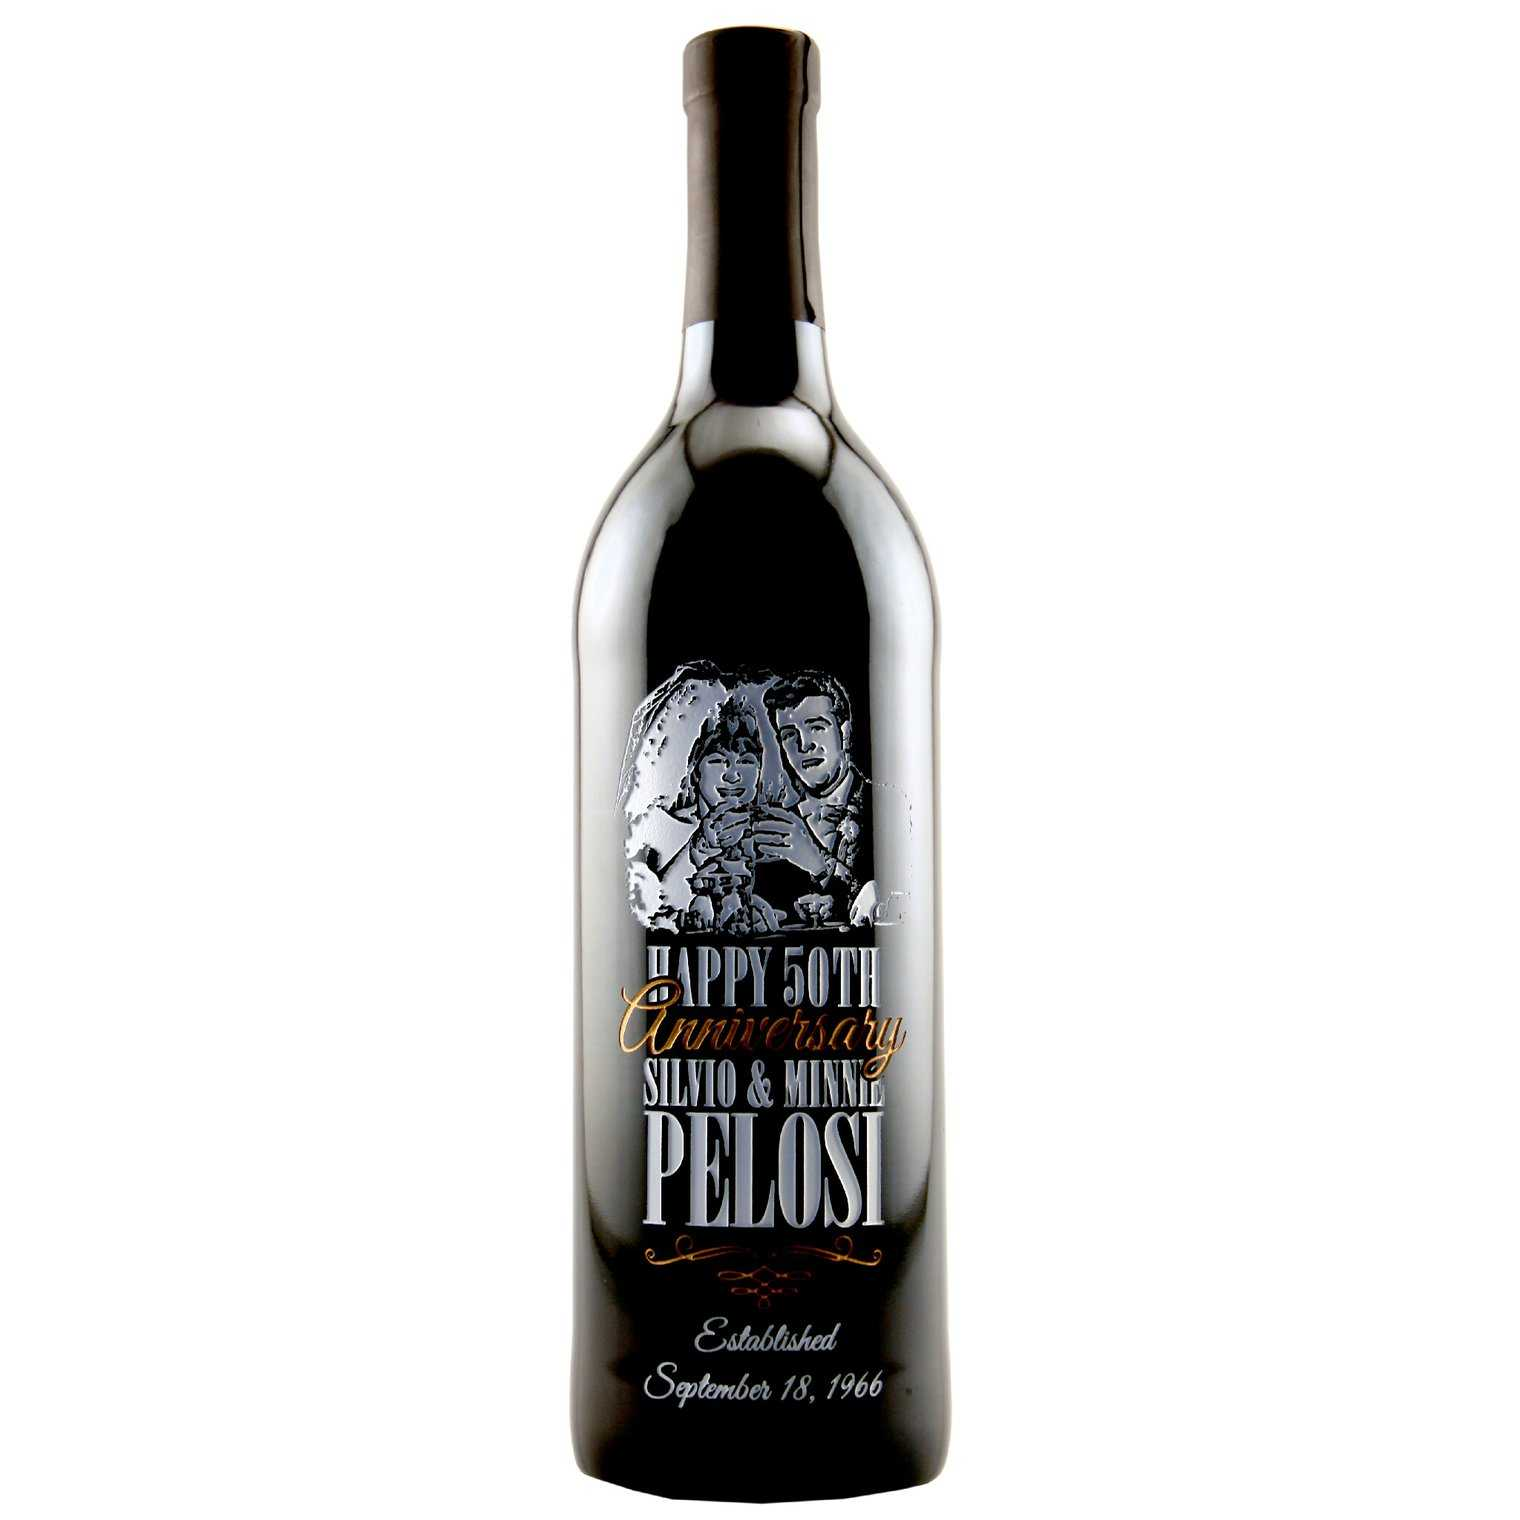 Custom 50th wedding anniversary wine bottle